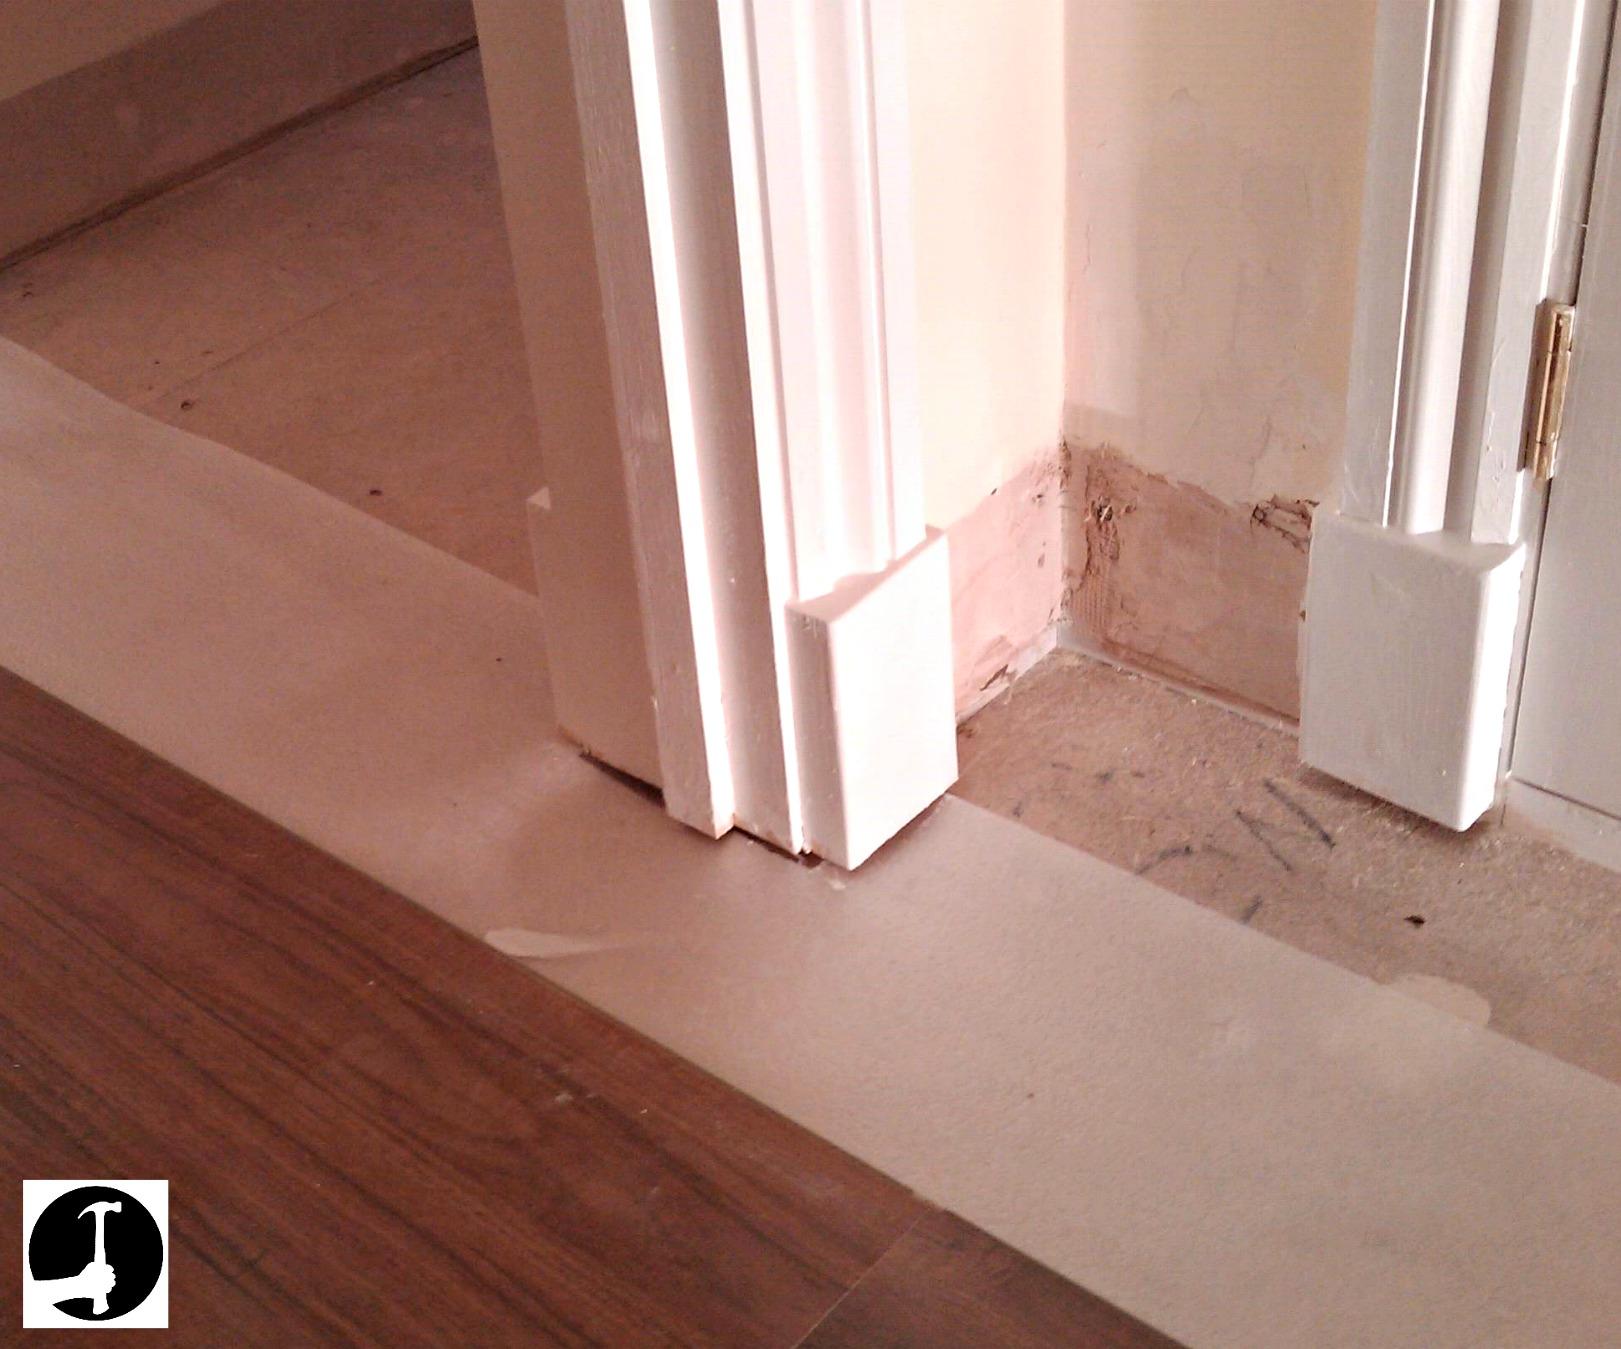 Laying Laminate In A Doorway